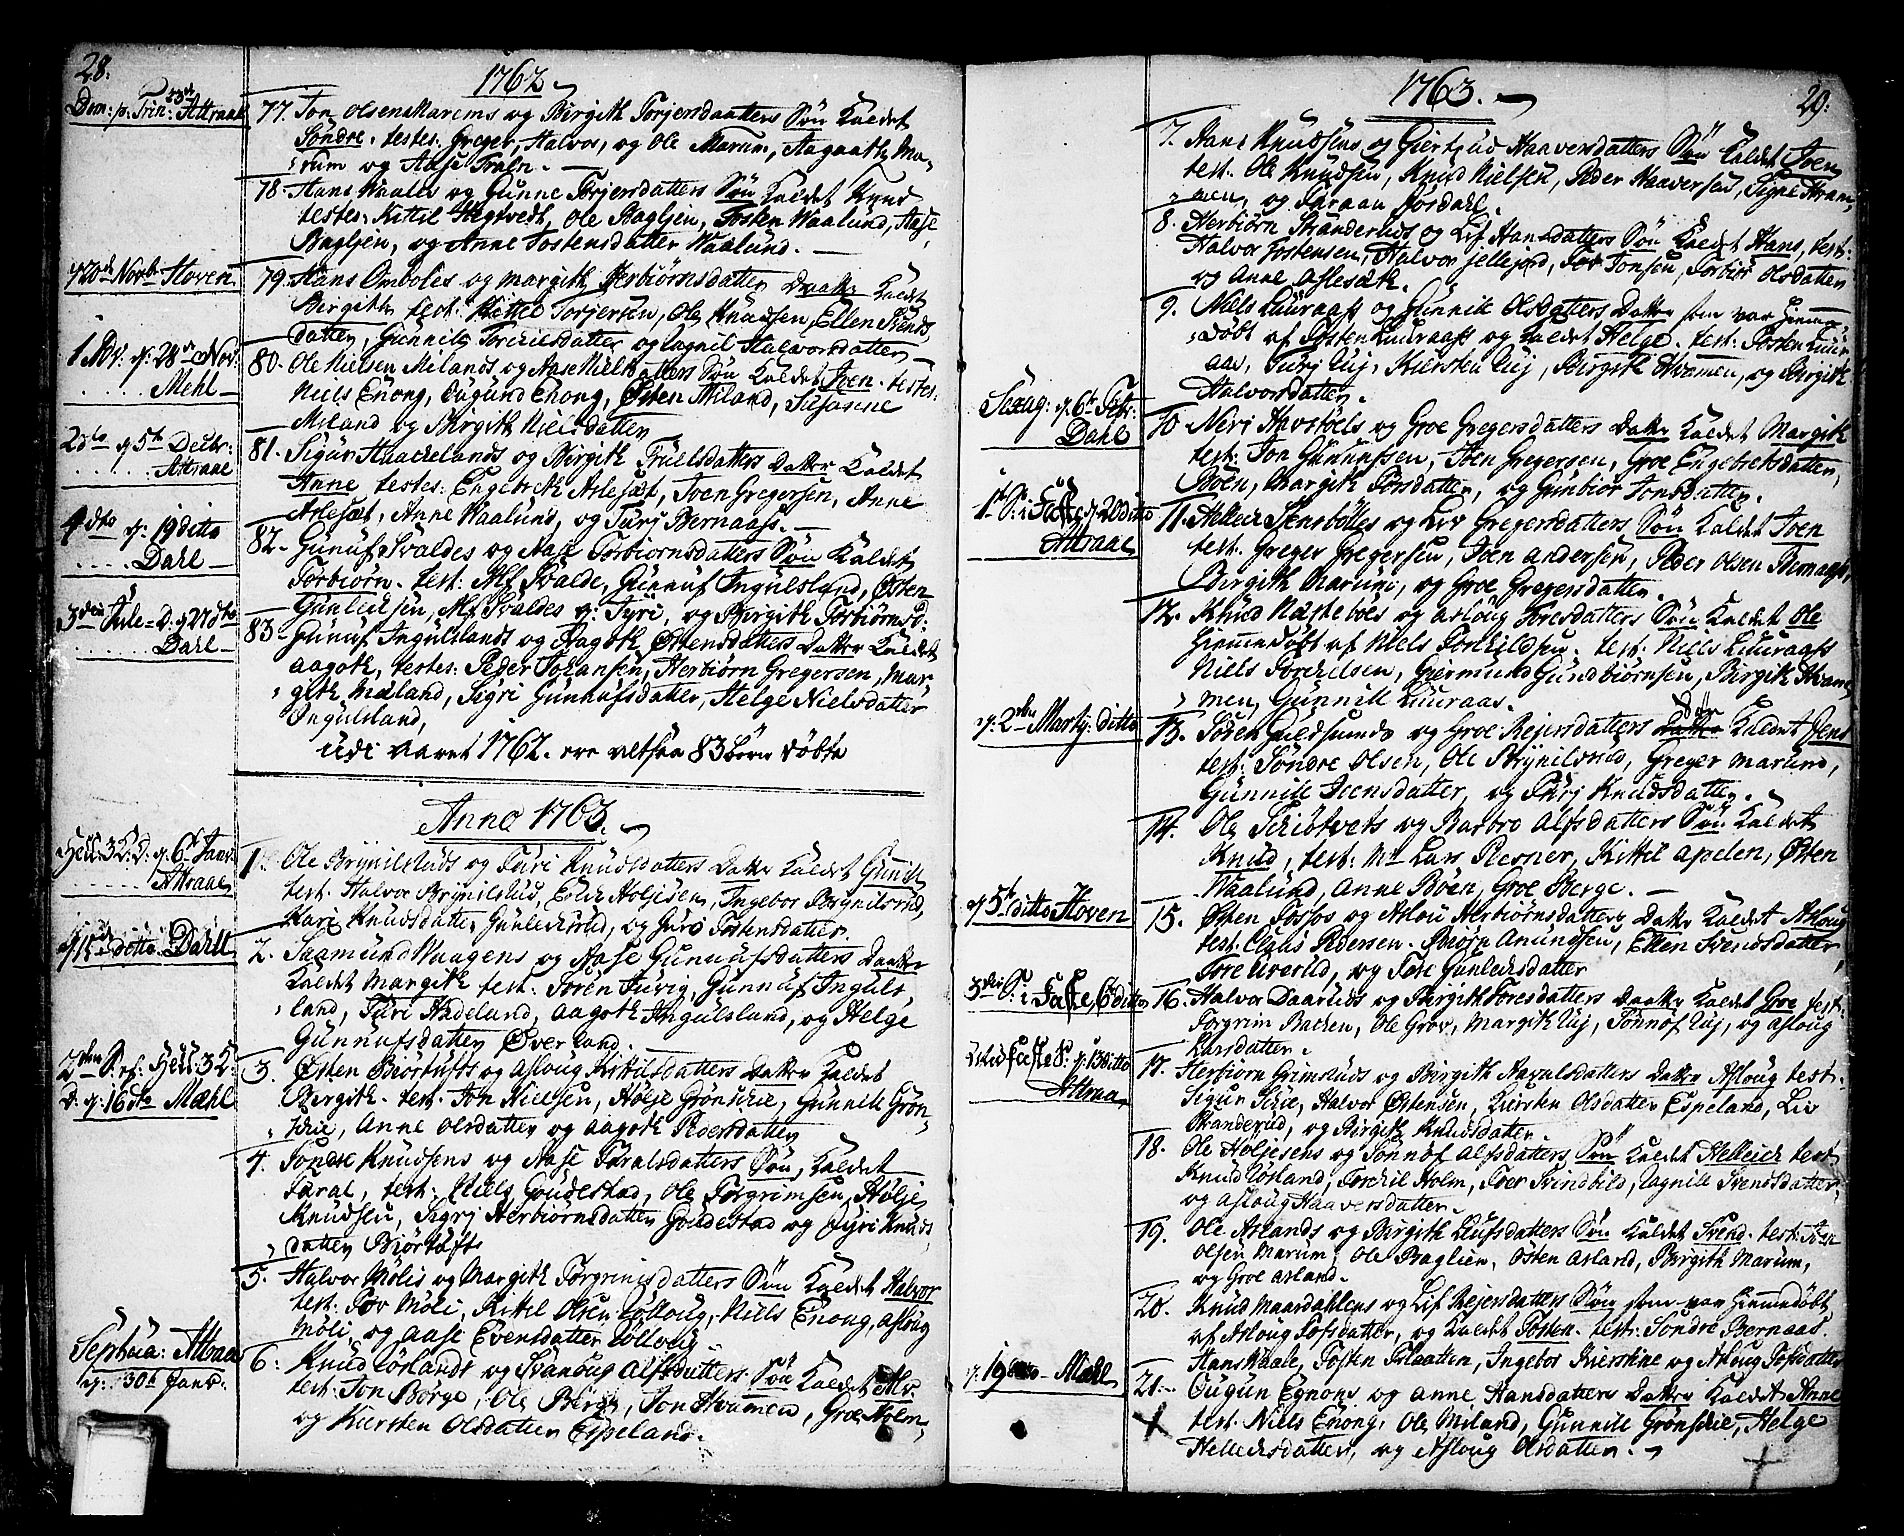 SAKO, Tinn kirkebøker, F/Fa/L0002: Ministerialbok nr. I 2, 1757-1810, s. 28-29